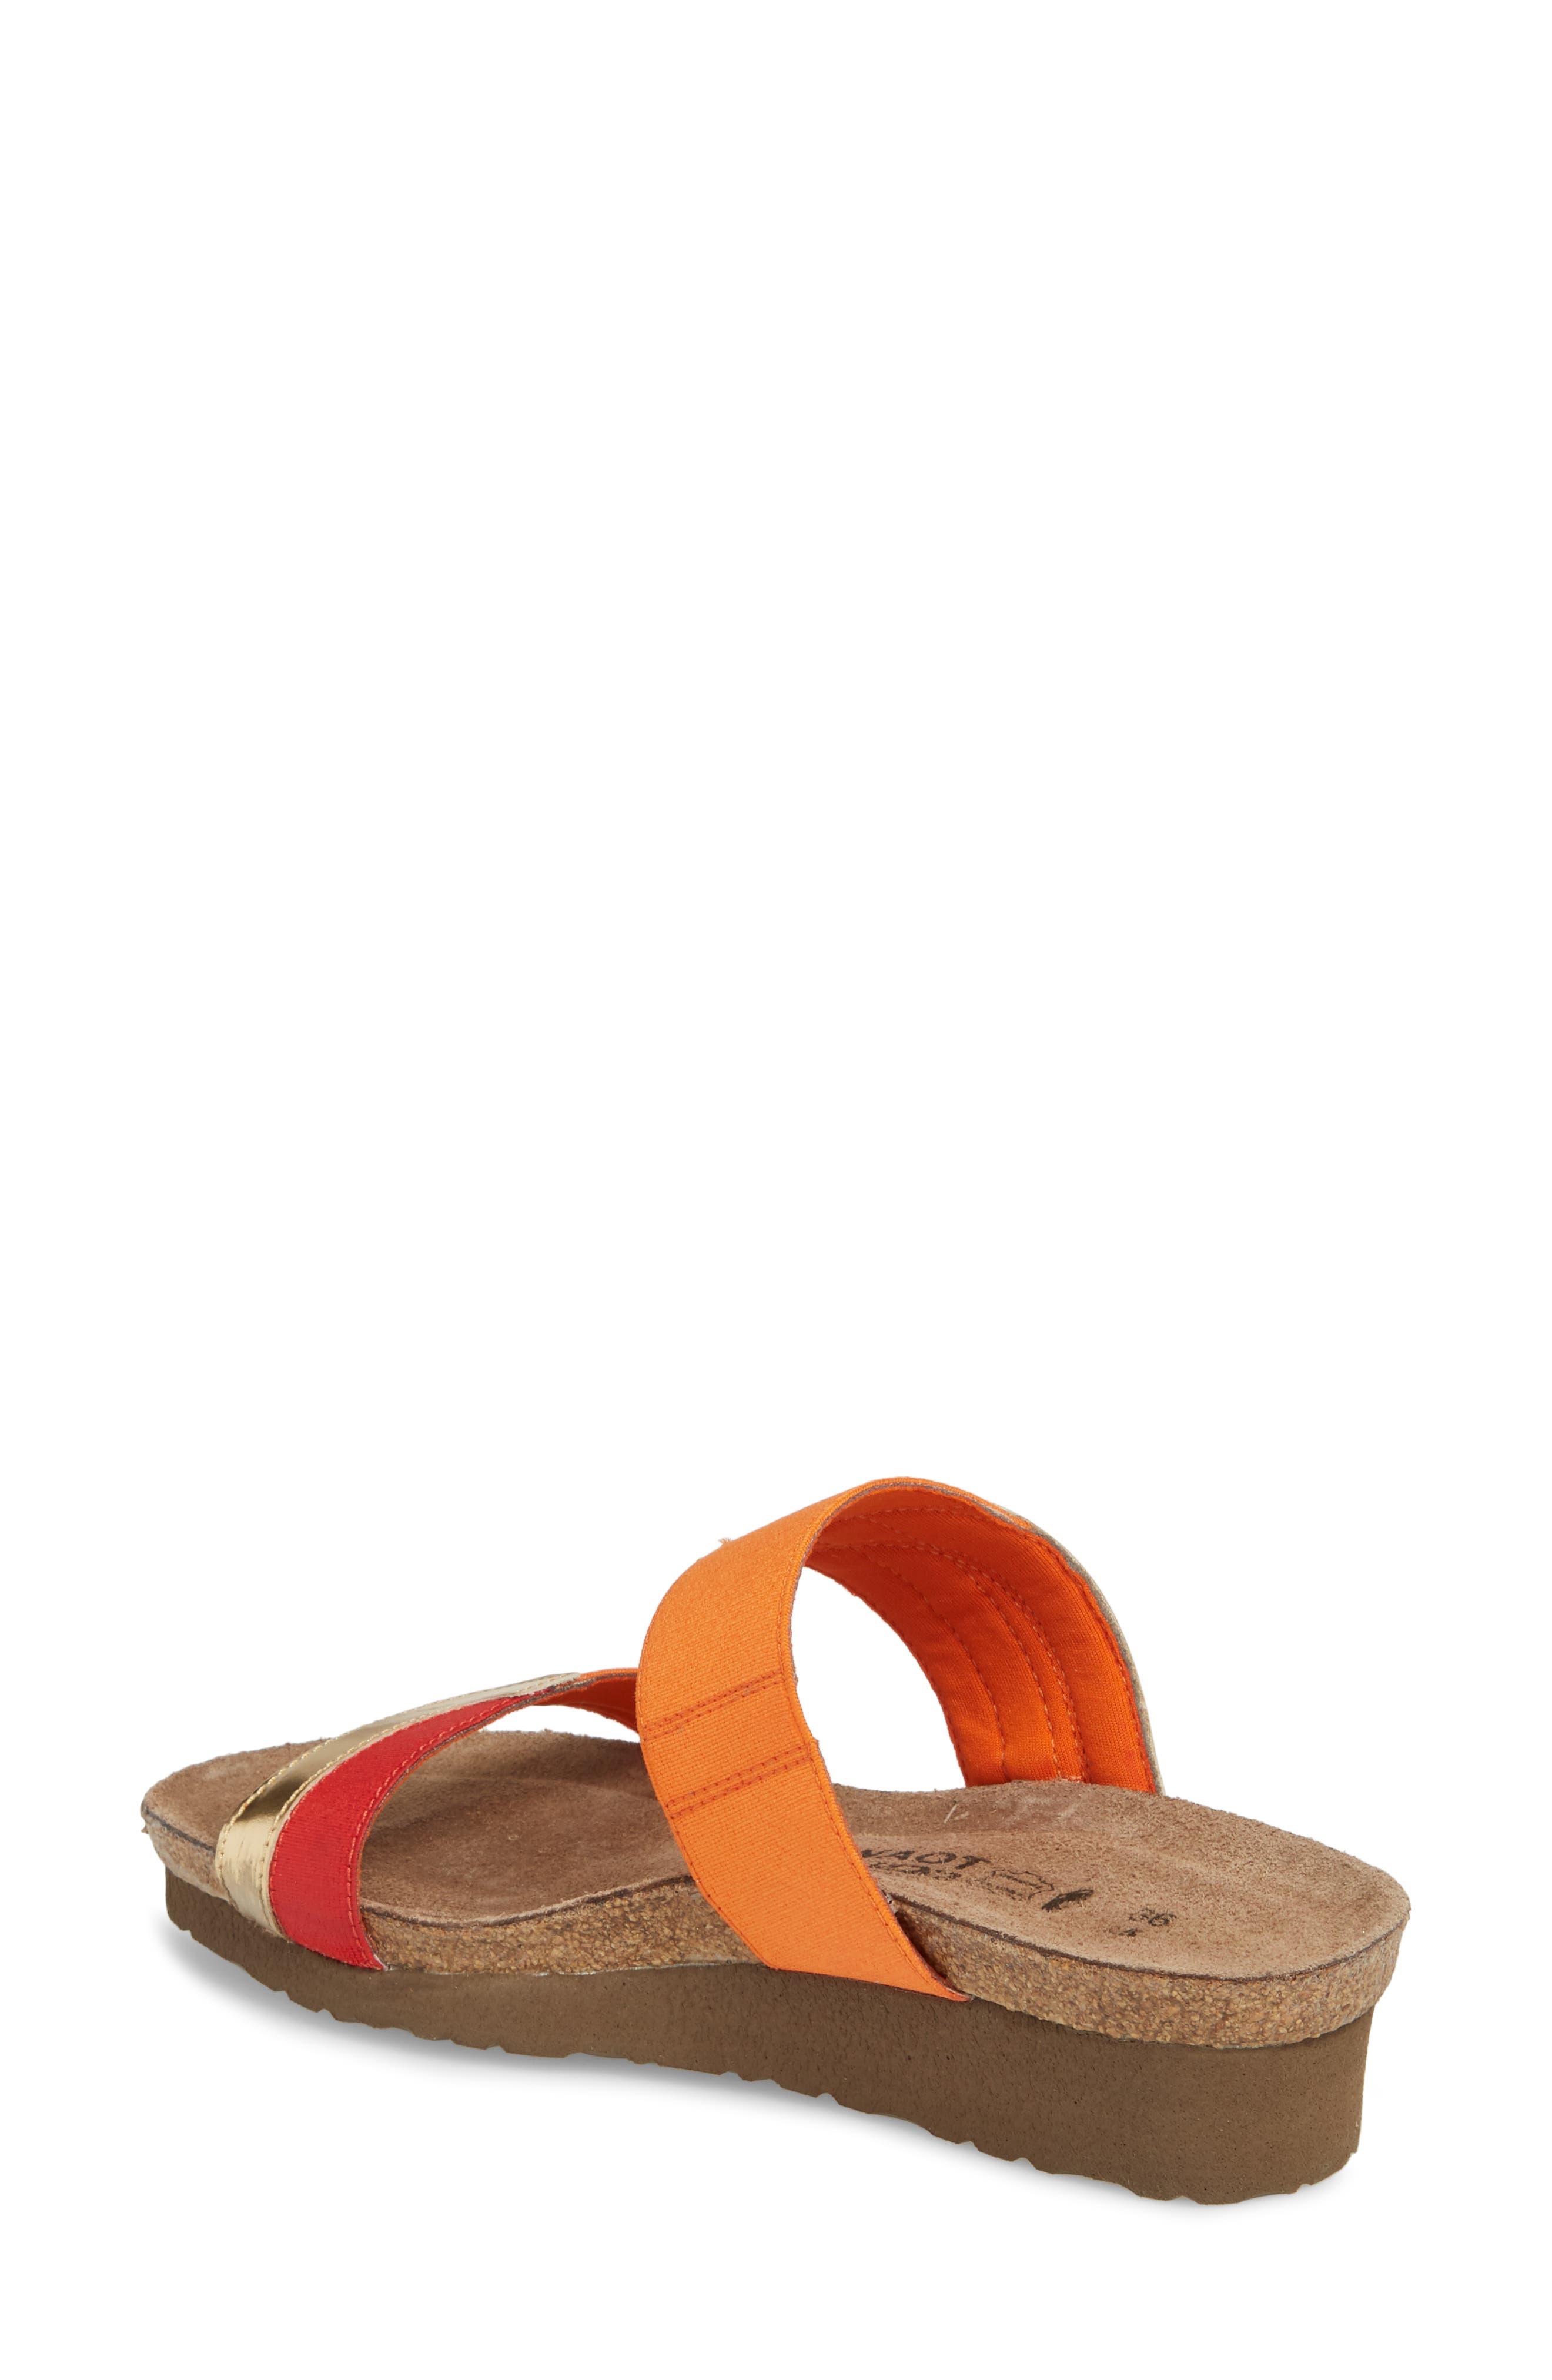 Frankie Slide Sandal,                             Alternate thumbnail 2, color,                             Red/ Orange/ Gold Leather